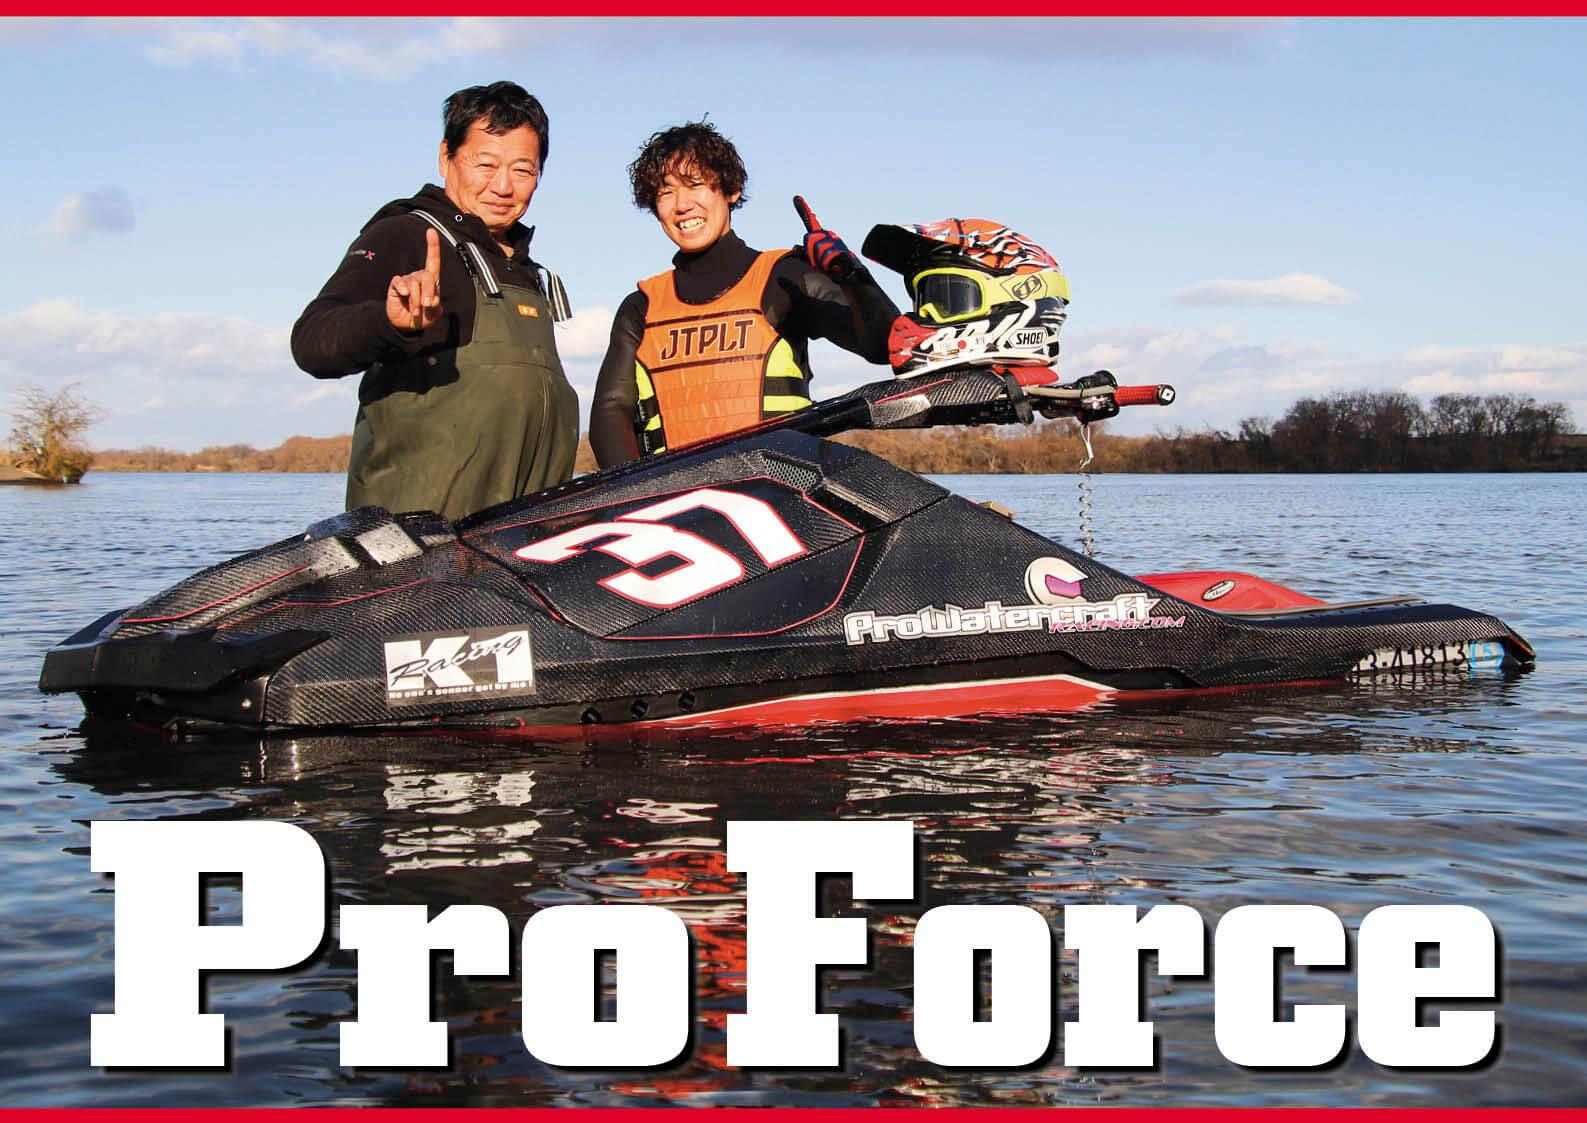 PRO FORCE(プロフォース) 世界を狙えるレースマシンの秘密を徹底解剖 (水上バイク)ジェットスキー